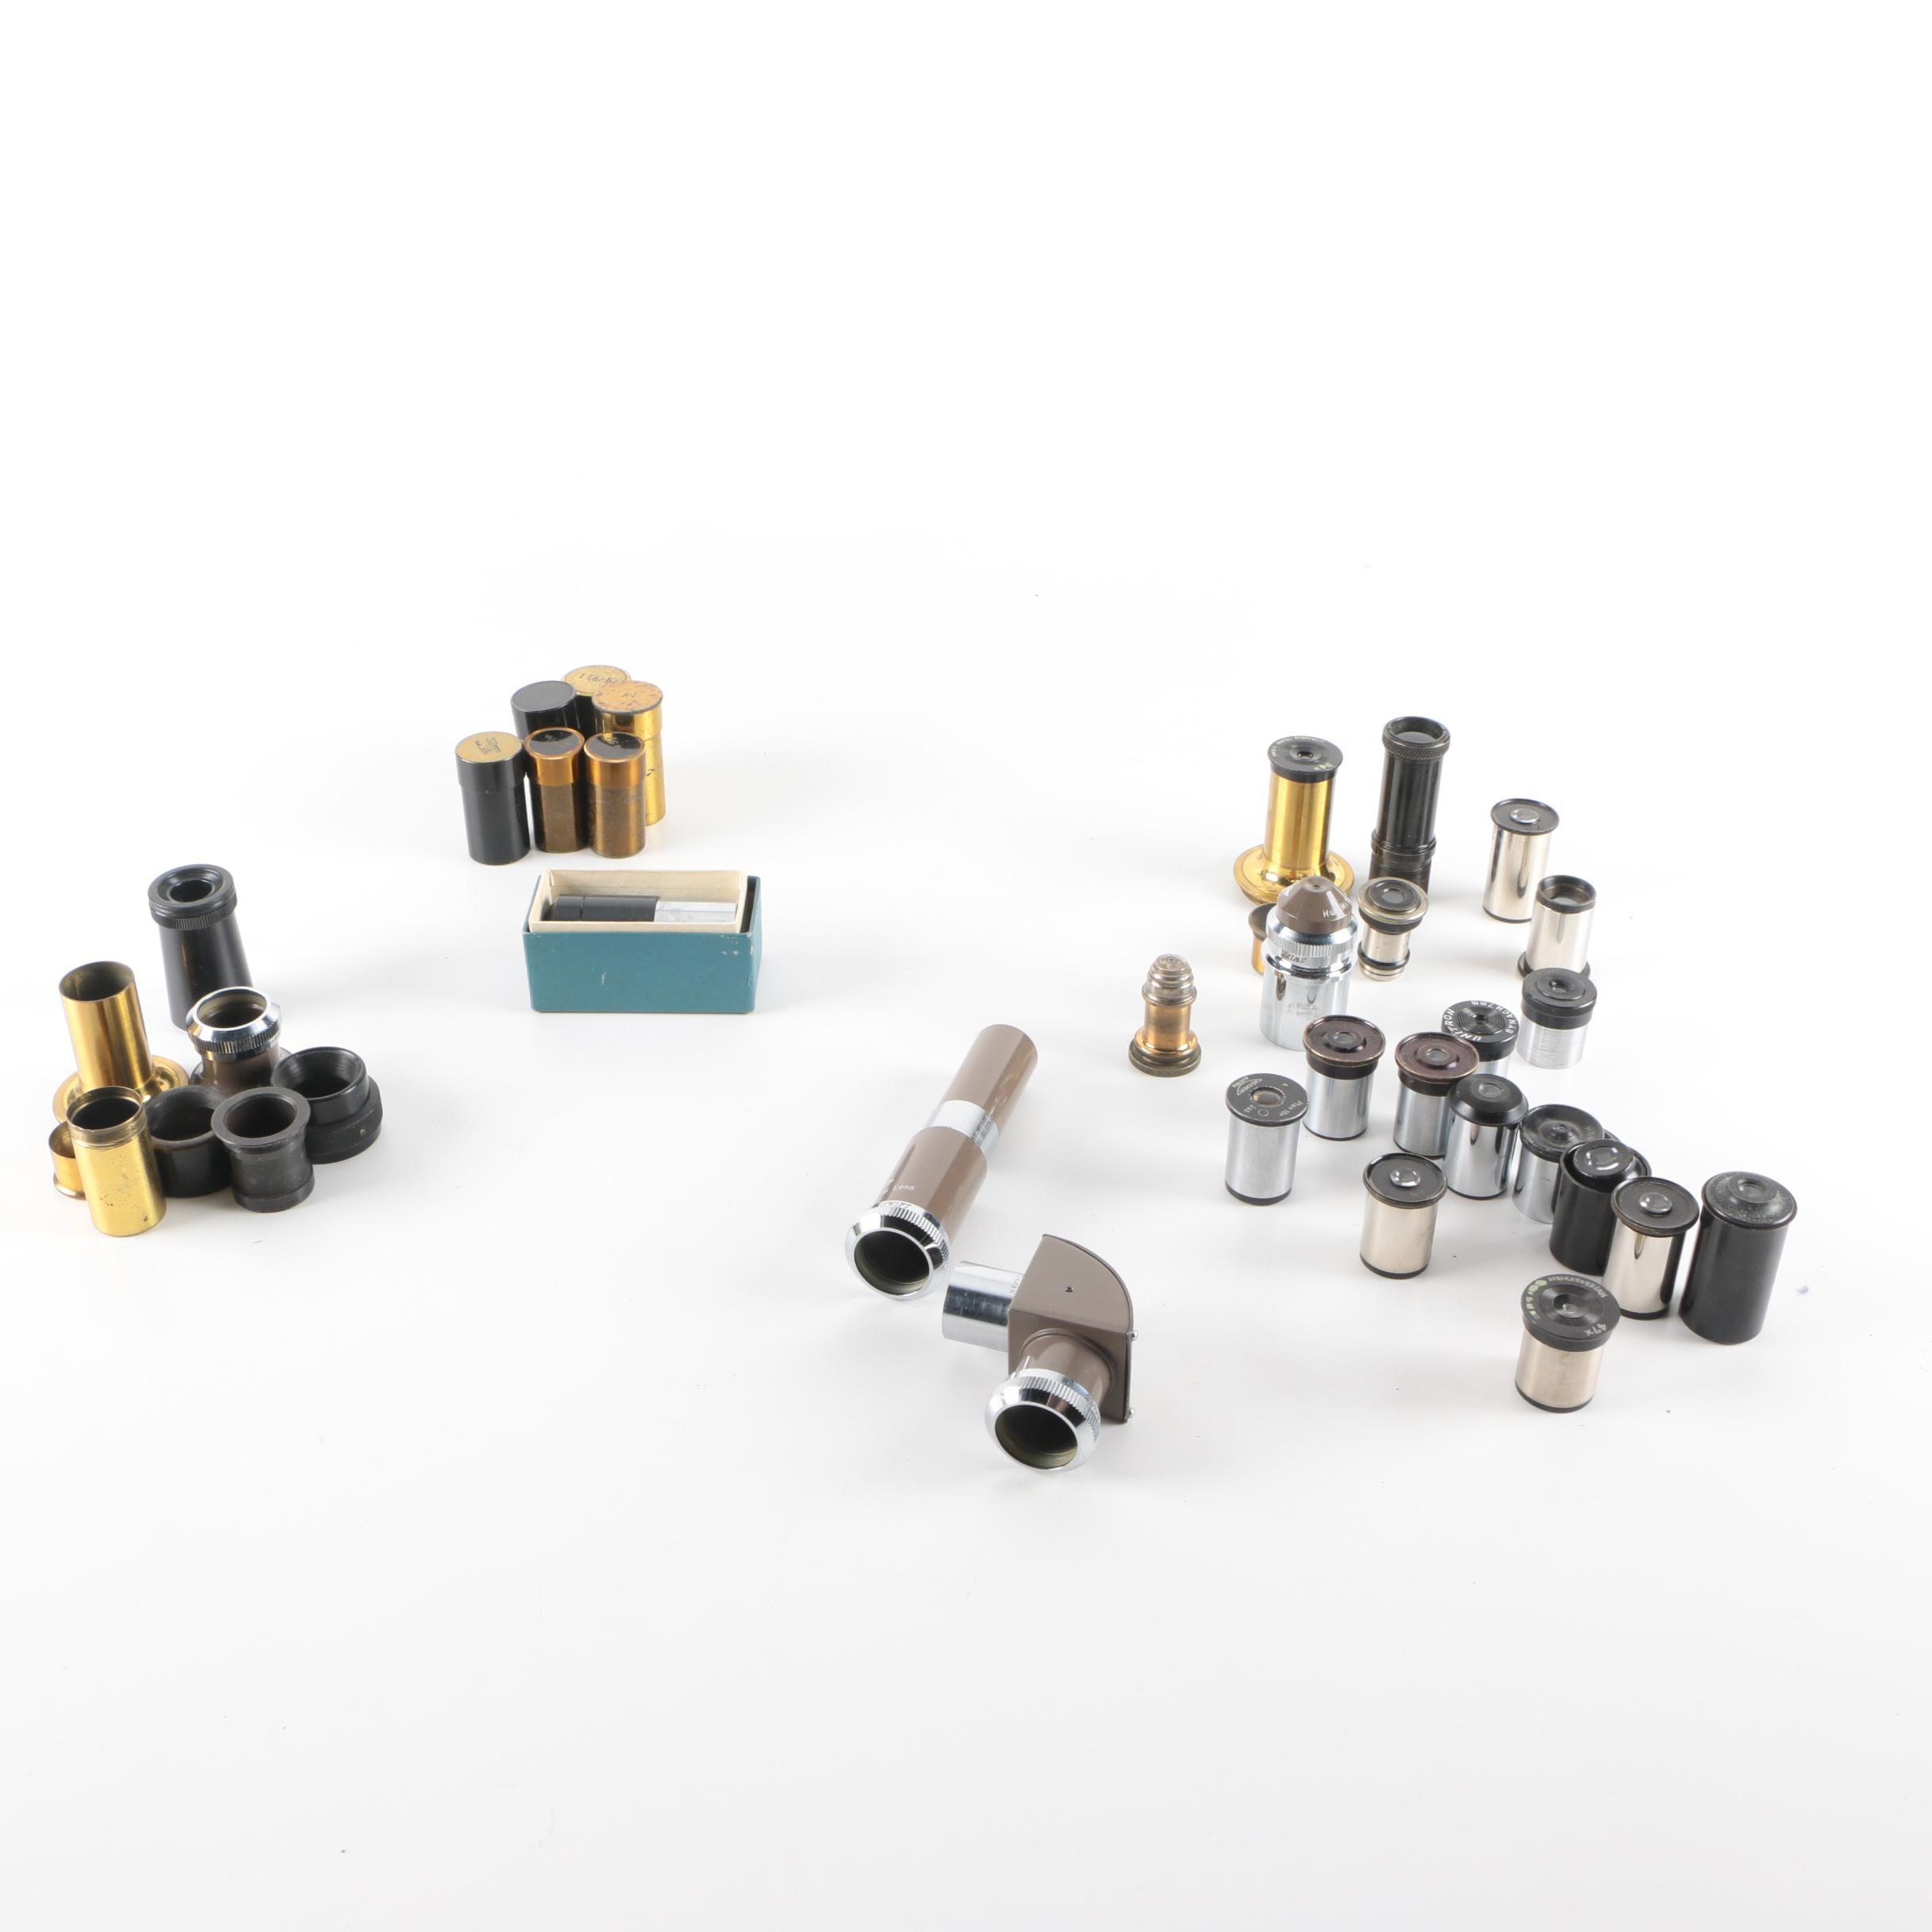 Microscope Optics and Accessories